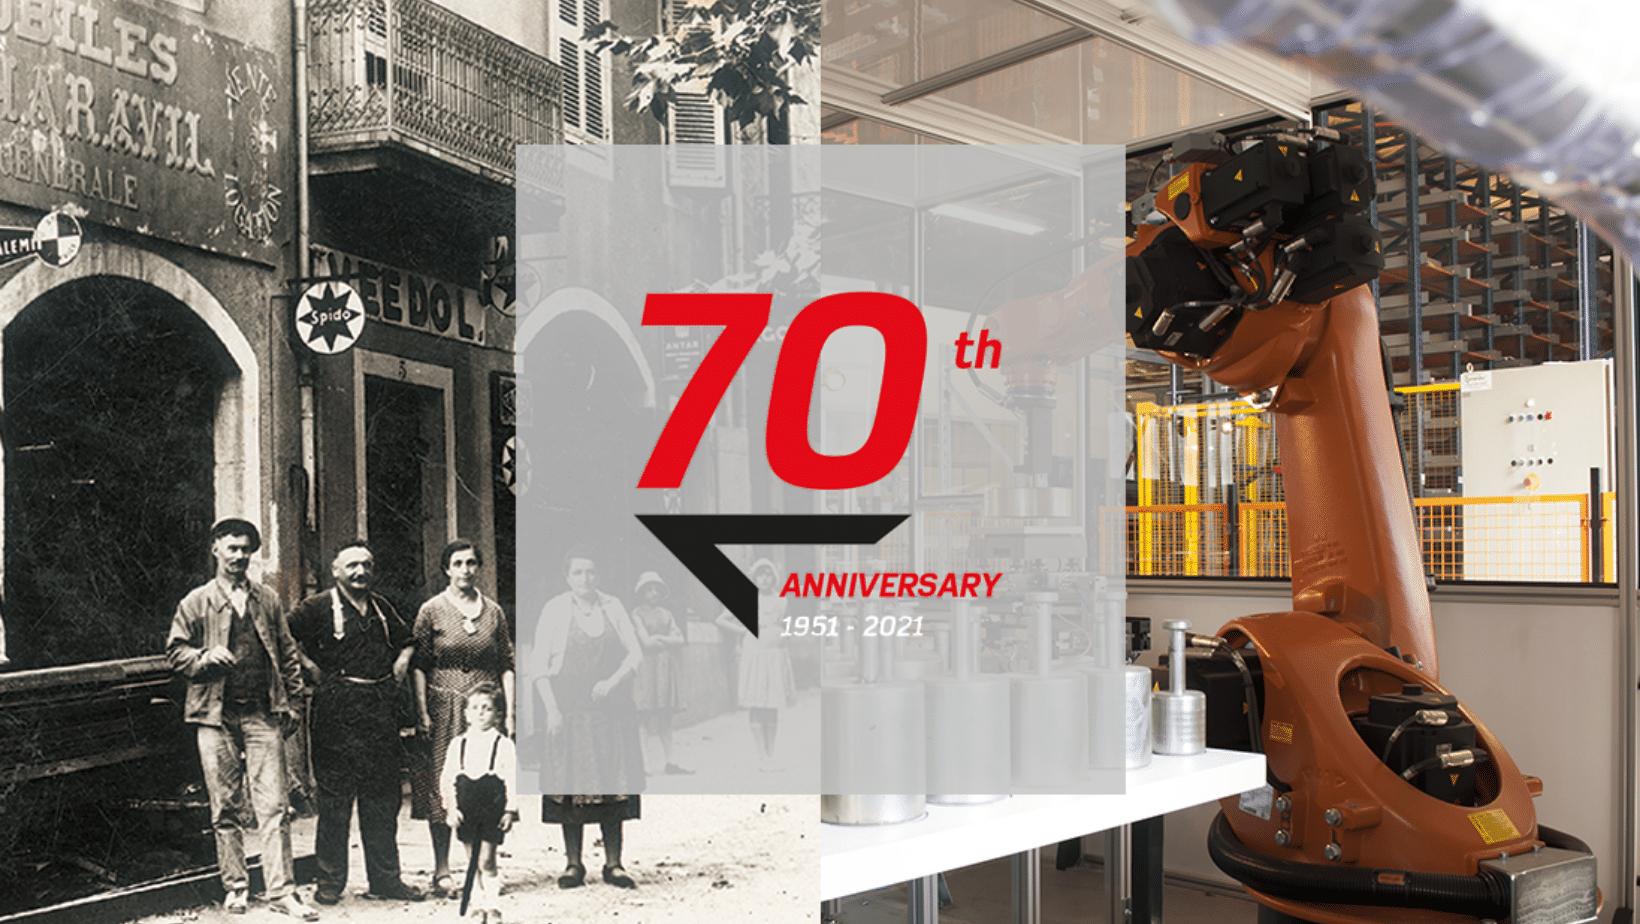 Precia Molen viert 70e verjaardag